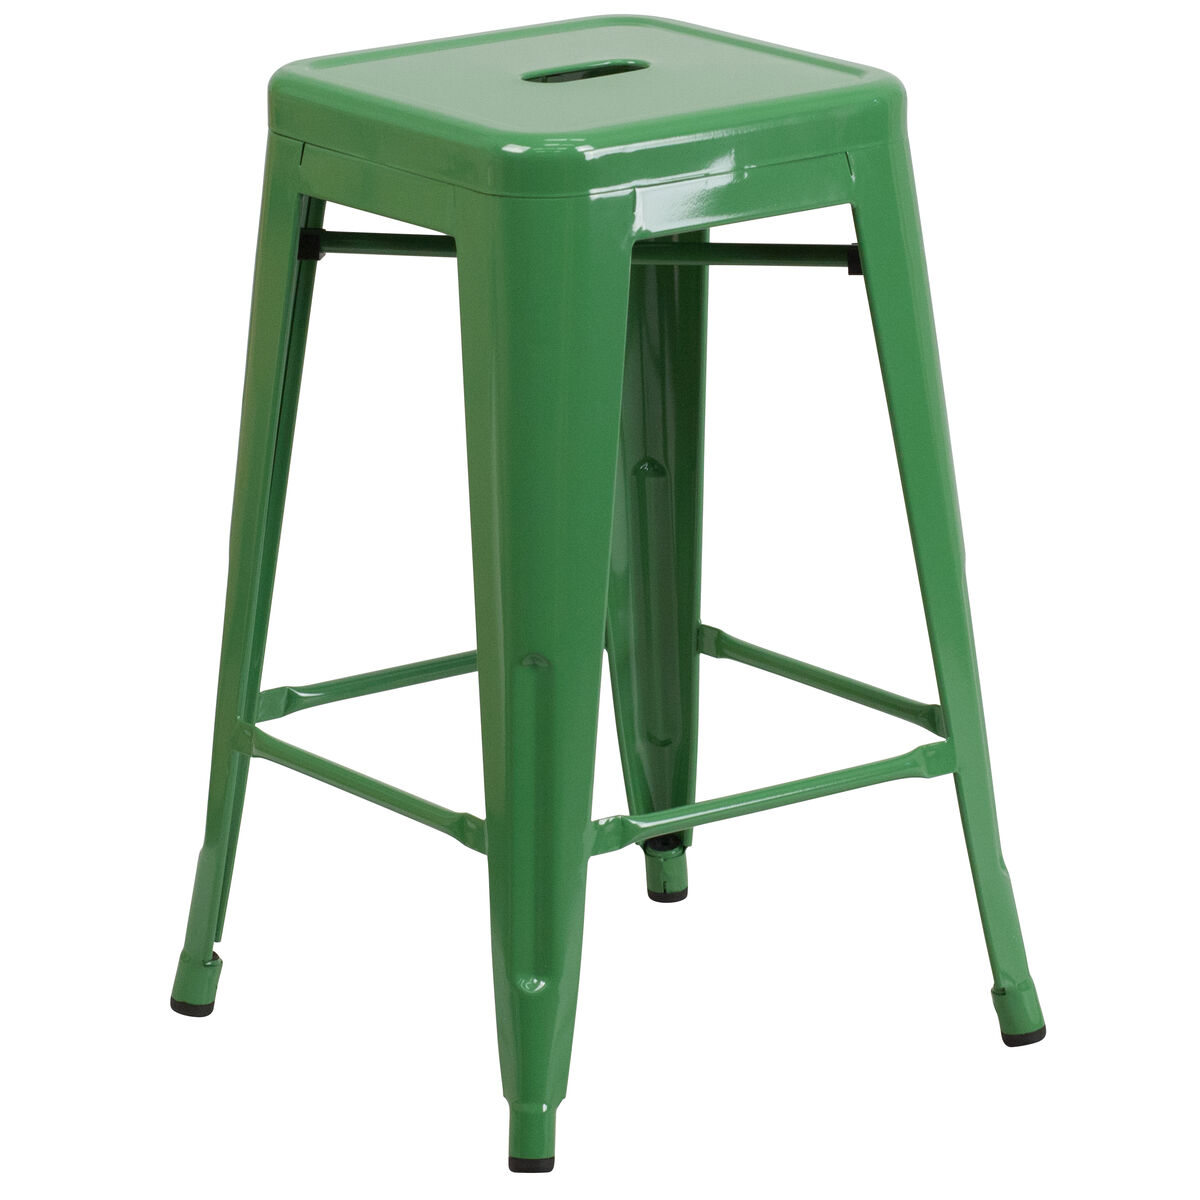 24 Quot Green No Back Metal Stool Ch 31320 24 Gn Gg Bizchair Com